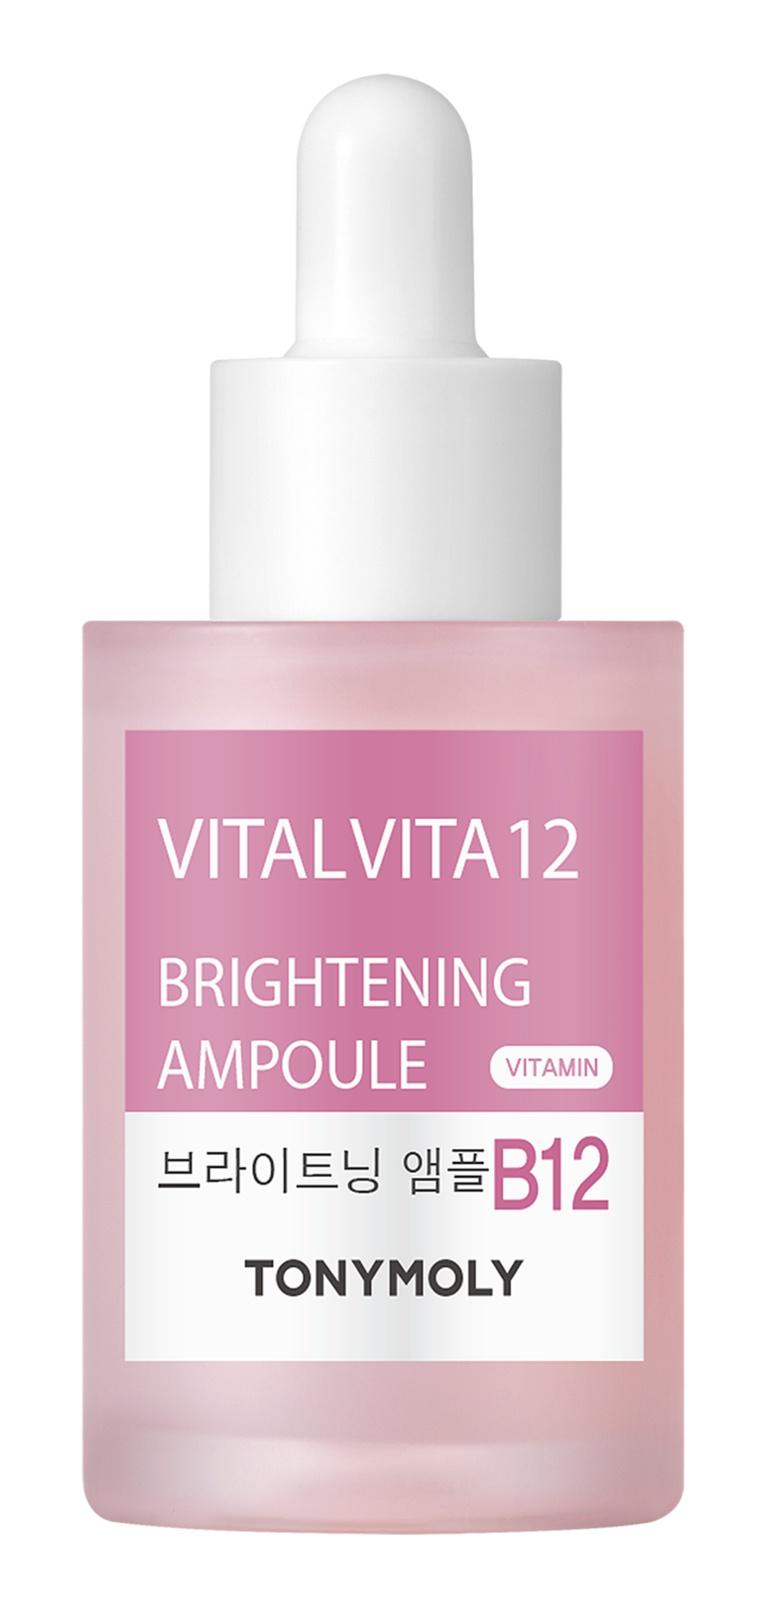 TonyMoly Vital Vita 12 Ampoules Firming